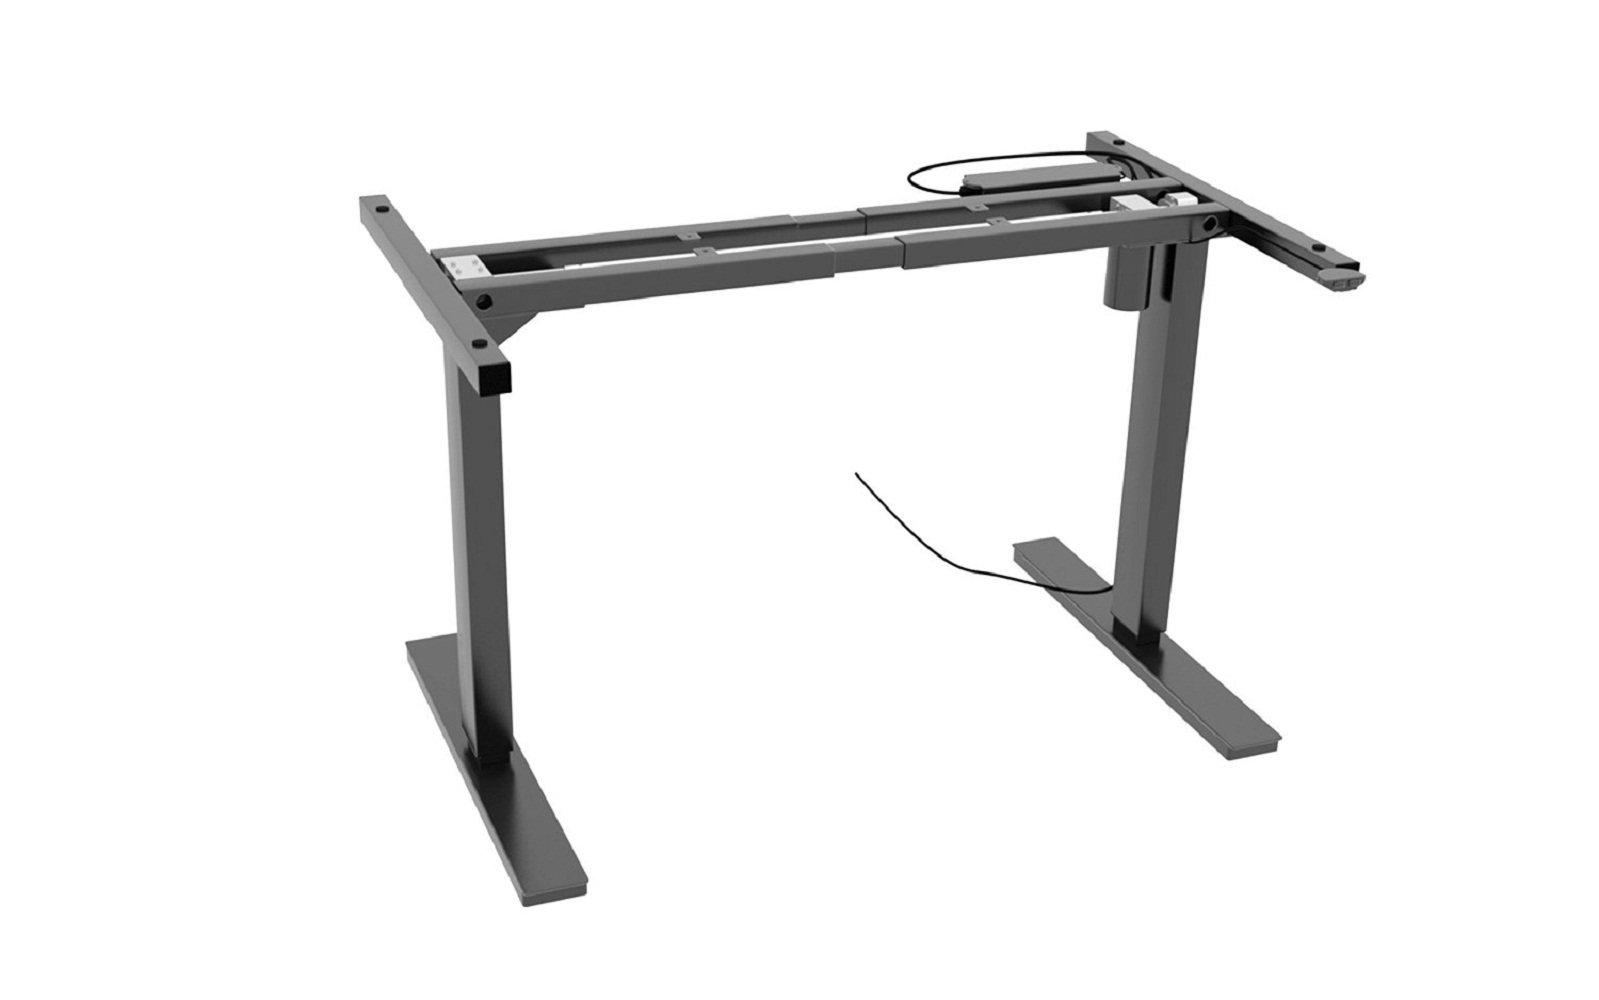 Ergomax Electric Height Adjustable Sit-Stand Desk- Ergo Office Desk